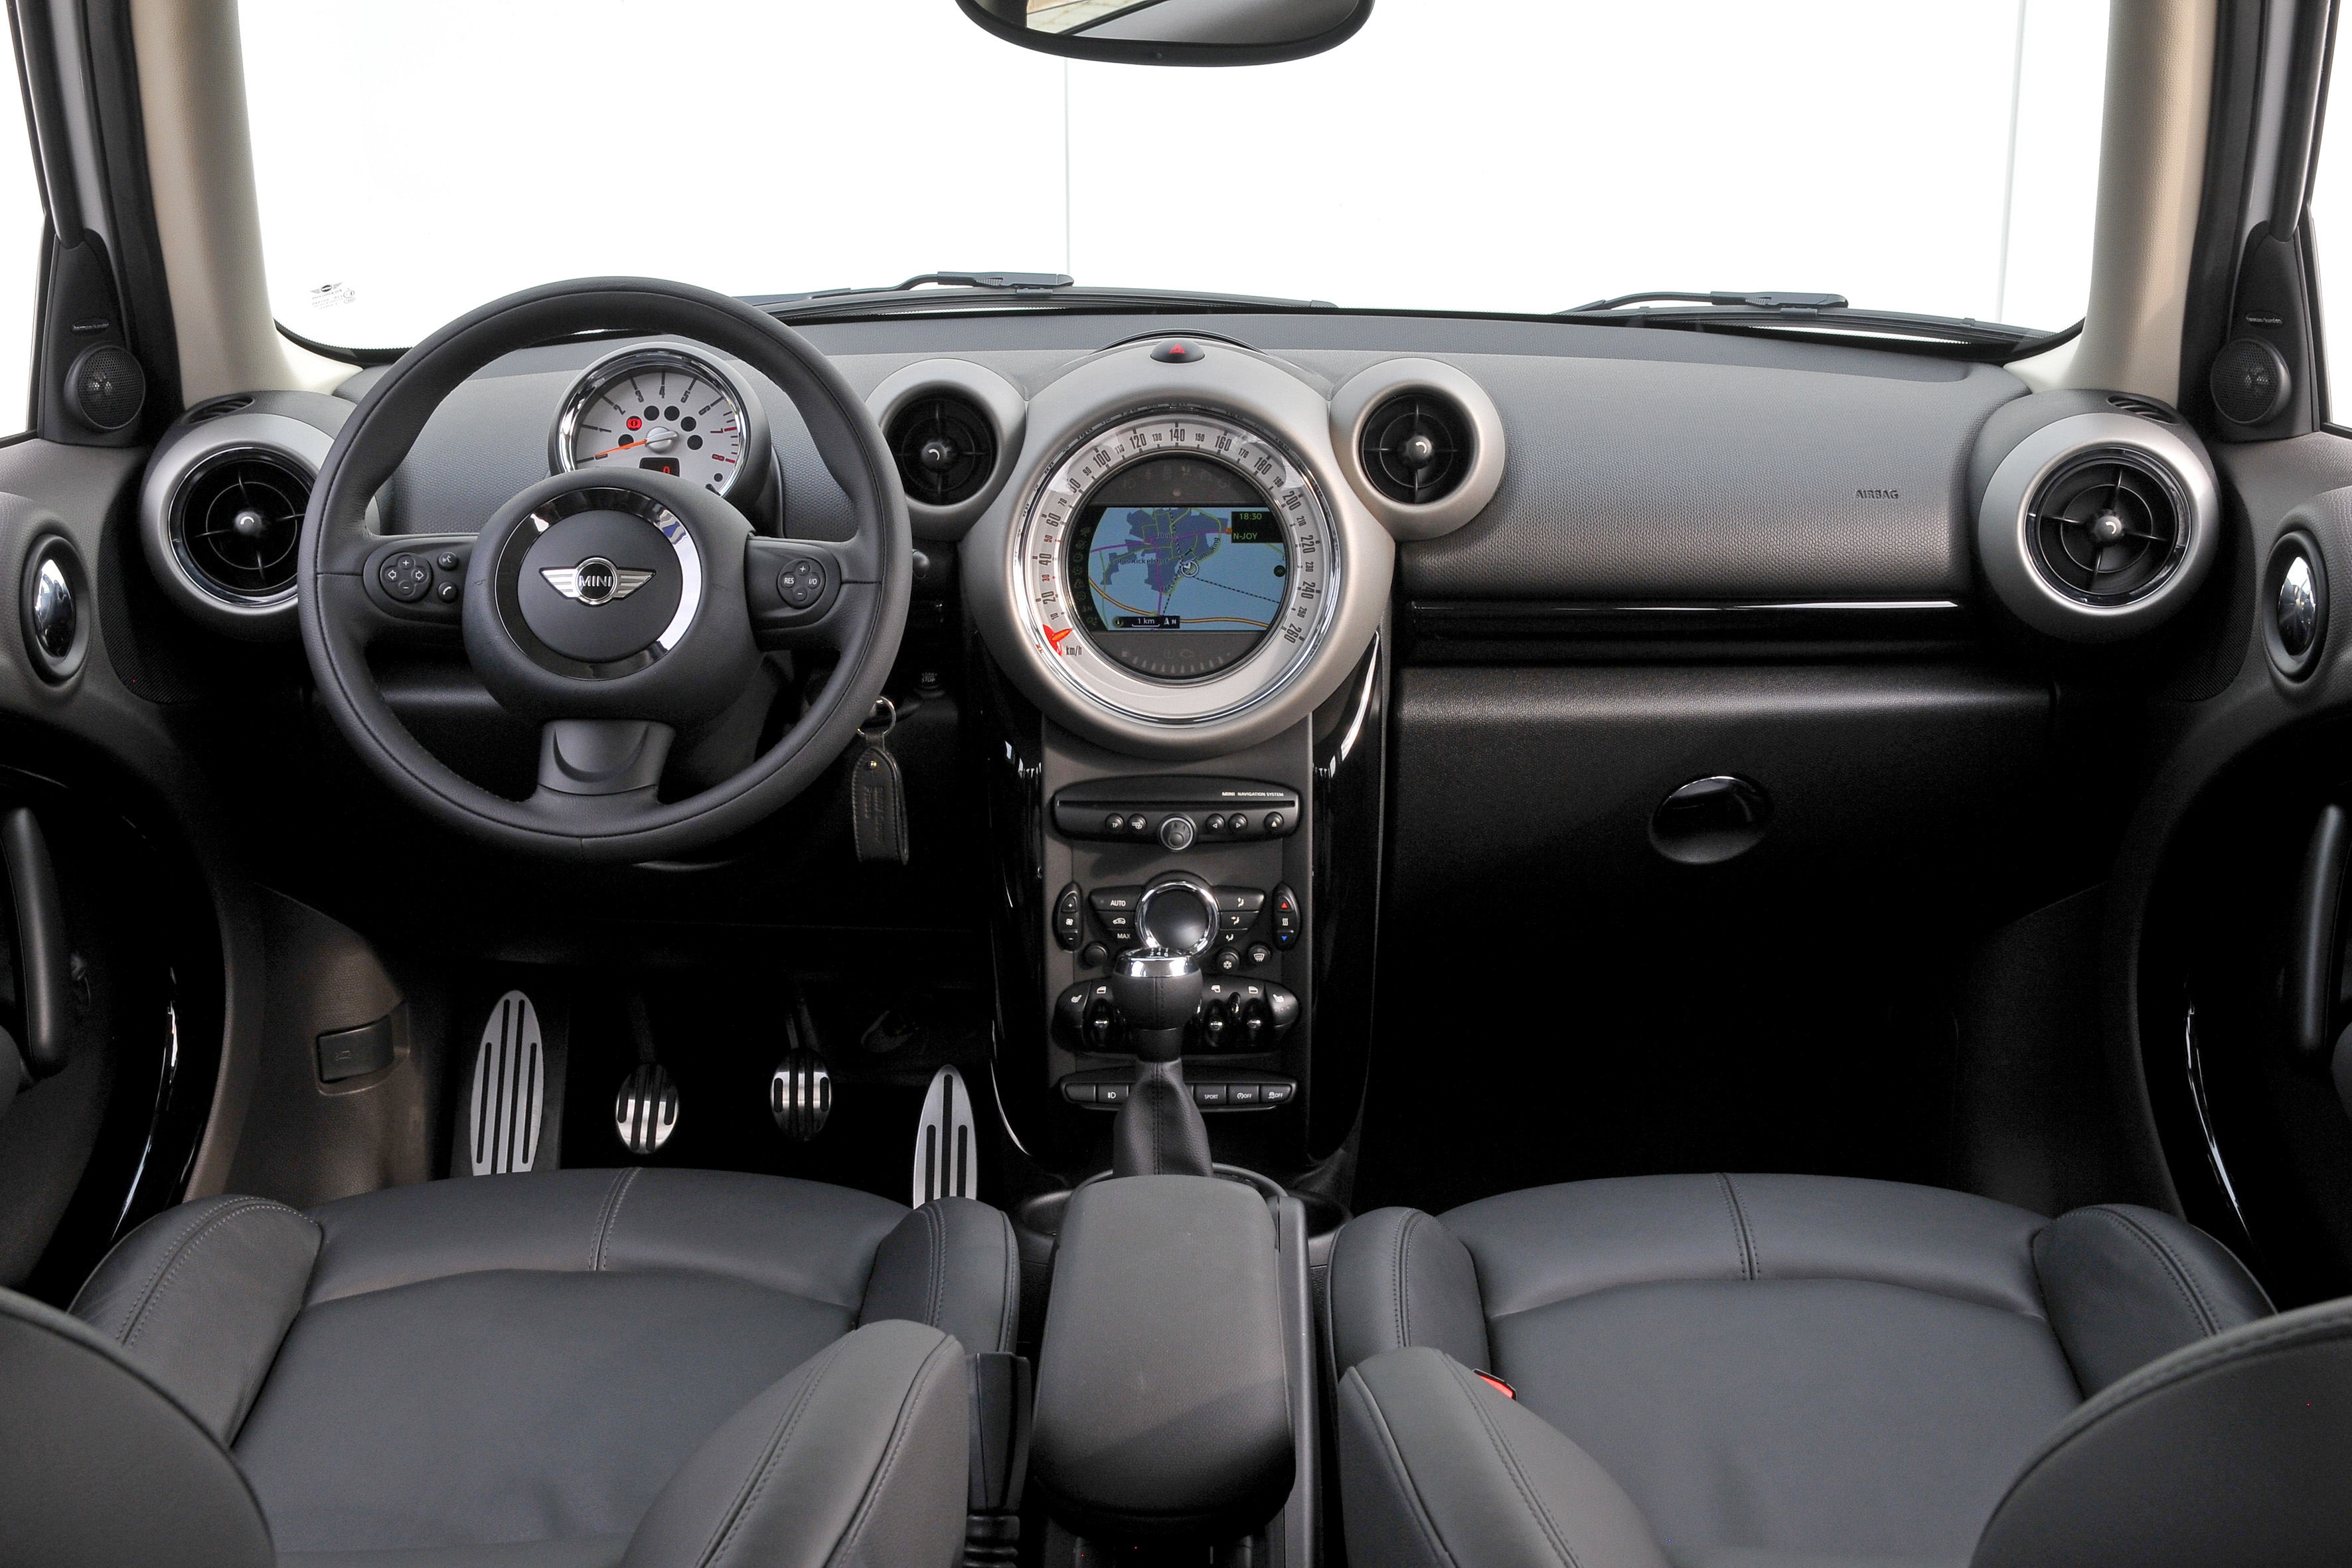 Test Drive: Mini Cooper S Countryman   Our Auto Expert